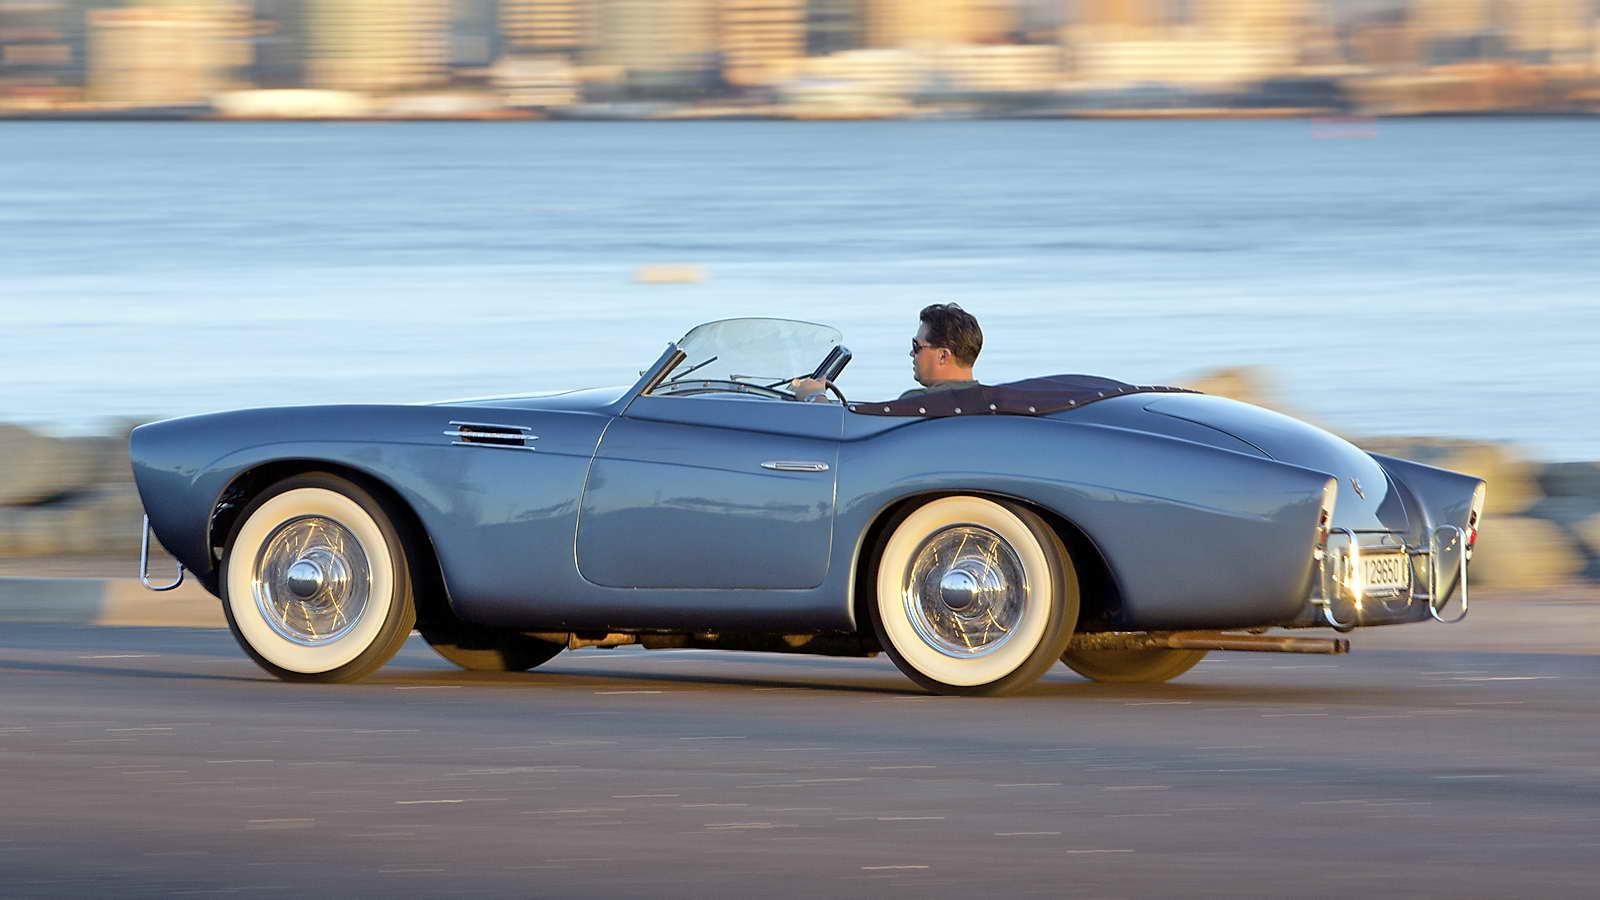 Pegaso Z 102 Series Ii Cabrio 1954 Coraz 243 N Espa 241 Ol A